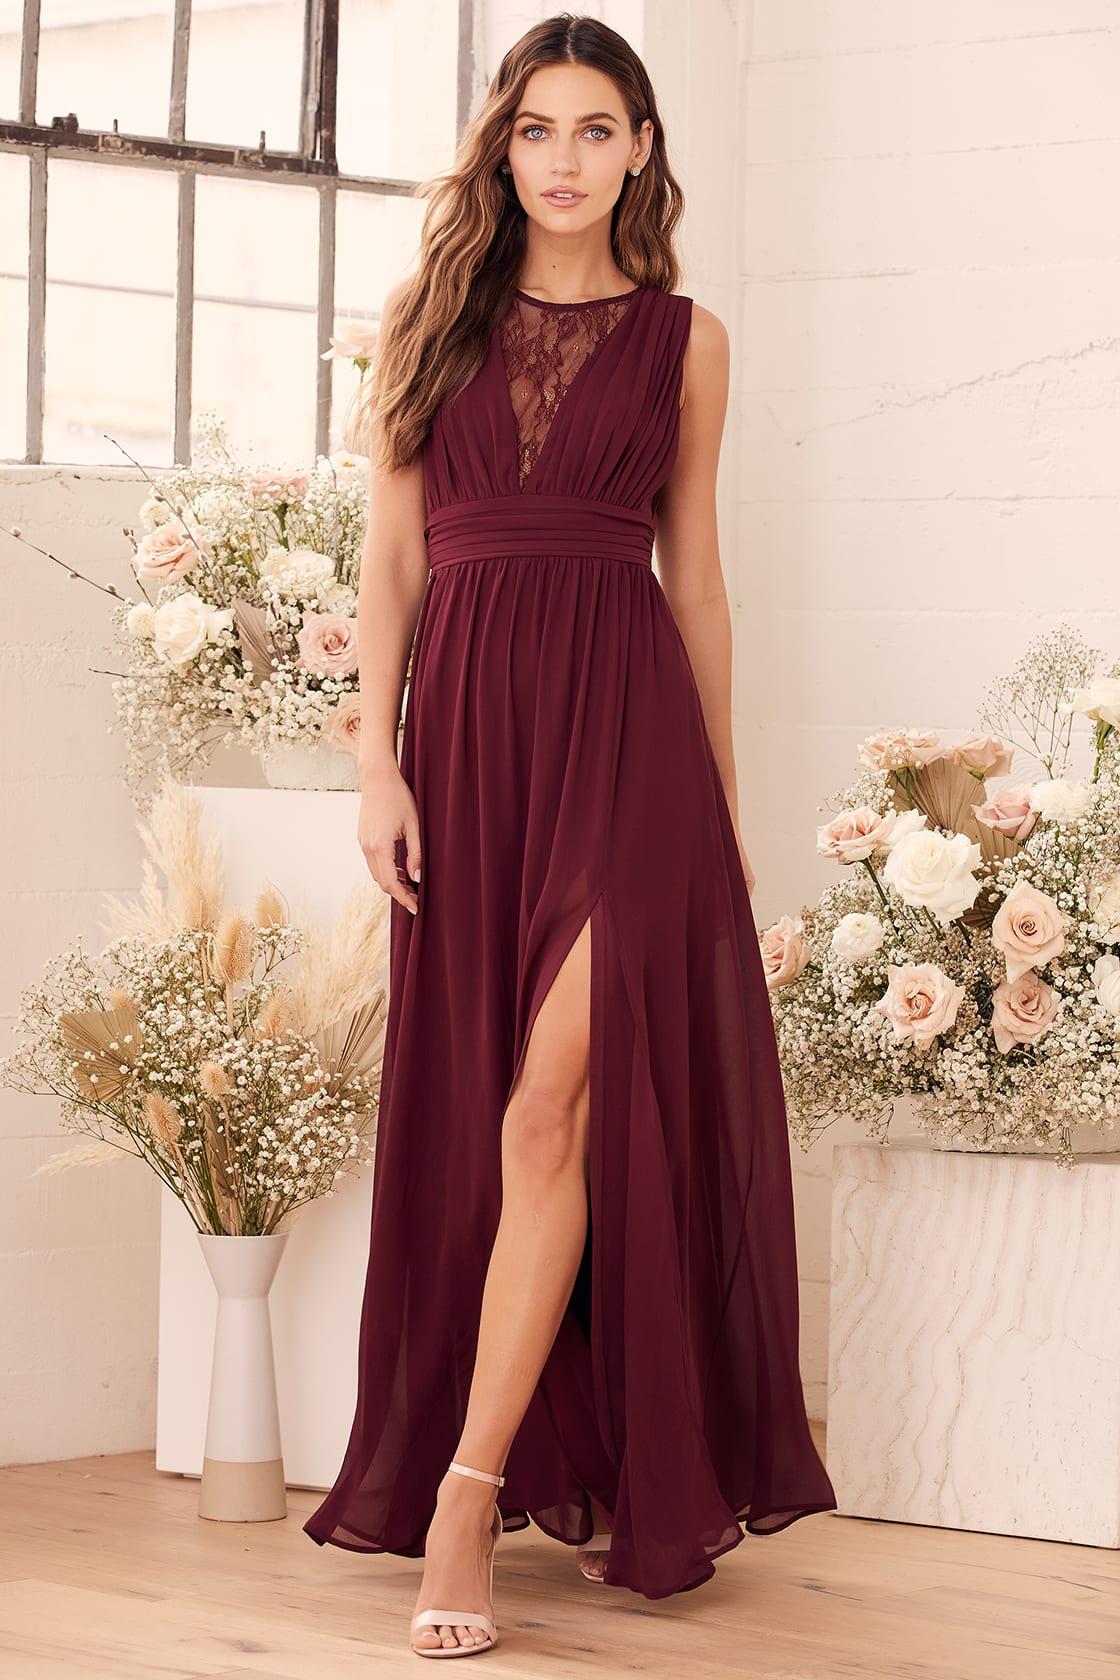 Dreamy Devotion Burgundy Lace Sleeveless Maxi Dress